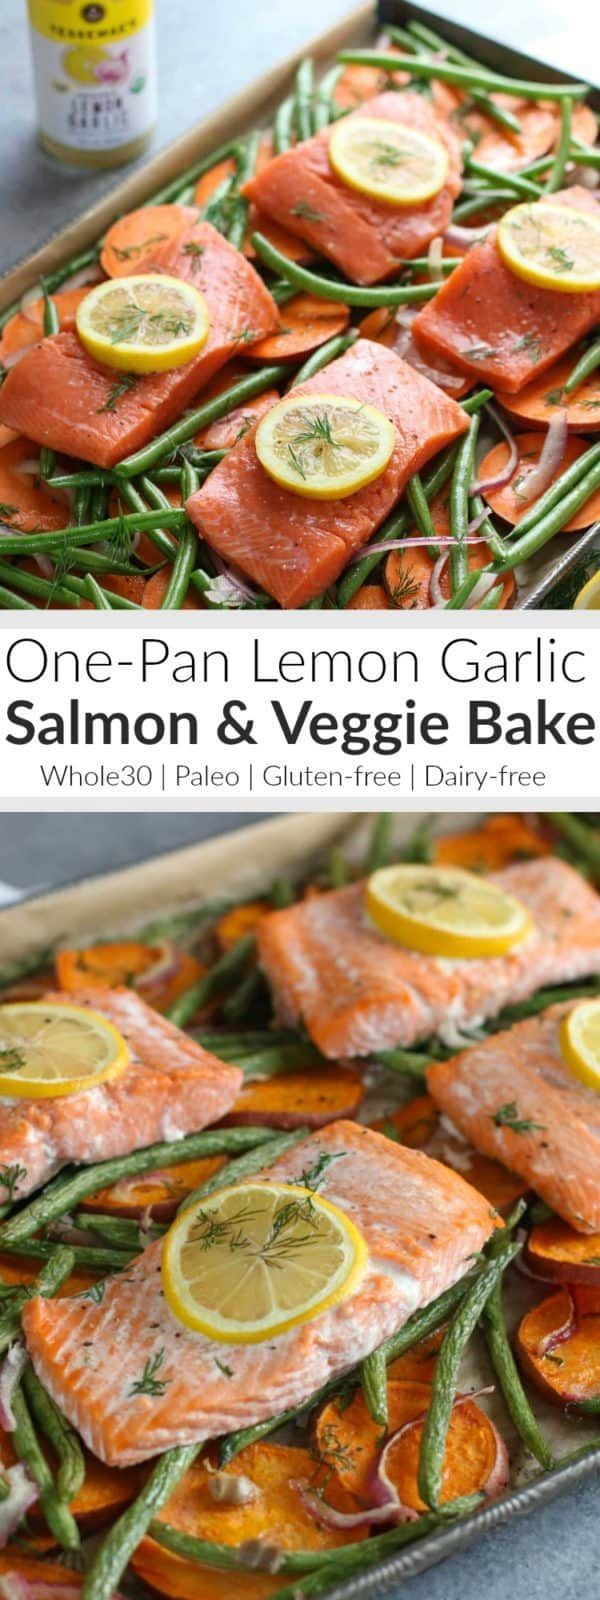 One-Pan Salmon and Veggie Bake #onepandinners One Pan Salmon & Veggie Bake | Whole30 salmon recipe | Gluten-free dinner | Dairy-free dinner | Paleo dinner | healthy dinner recipe | one pan dinner recipes || The Real Food Dietitians #onepanmeal #Whole30dinner #salmonrecipe #onepandinners